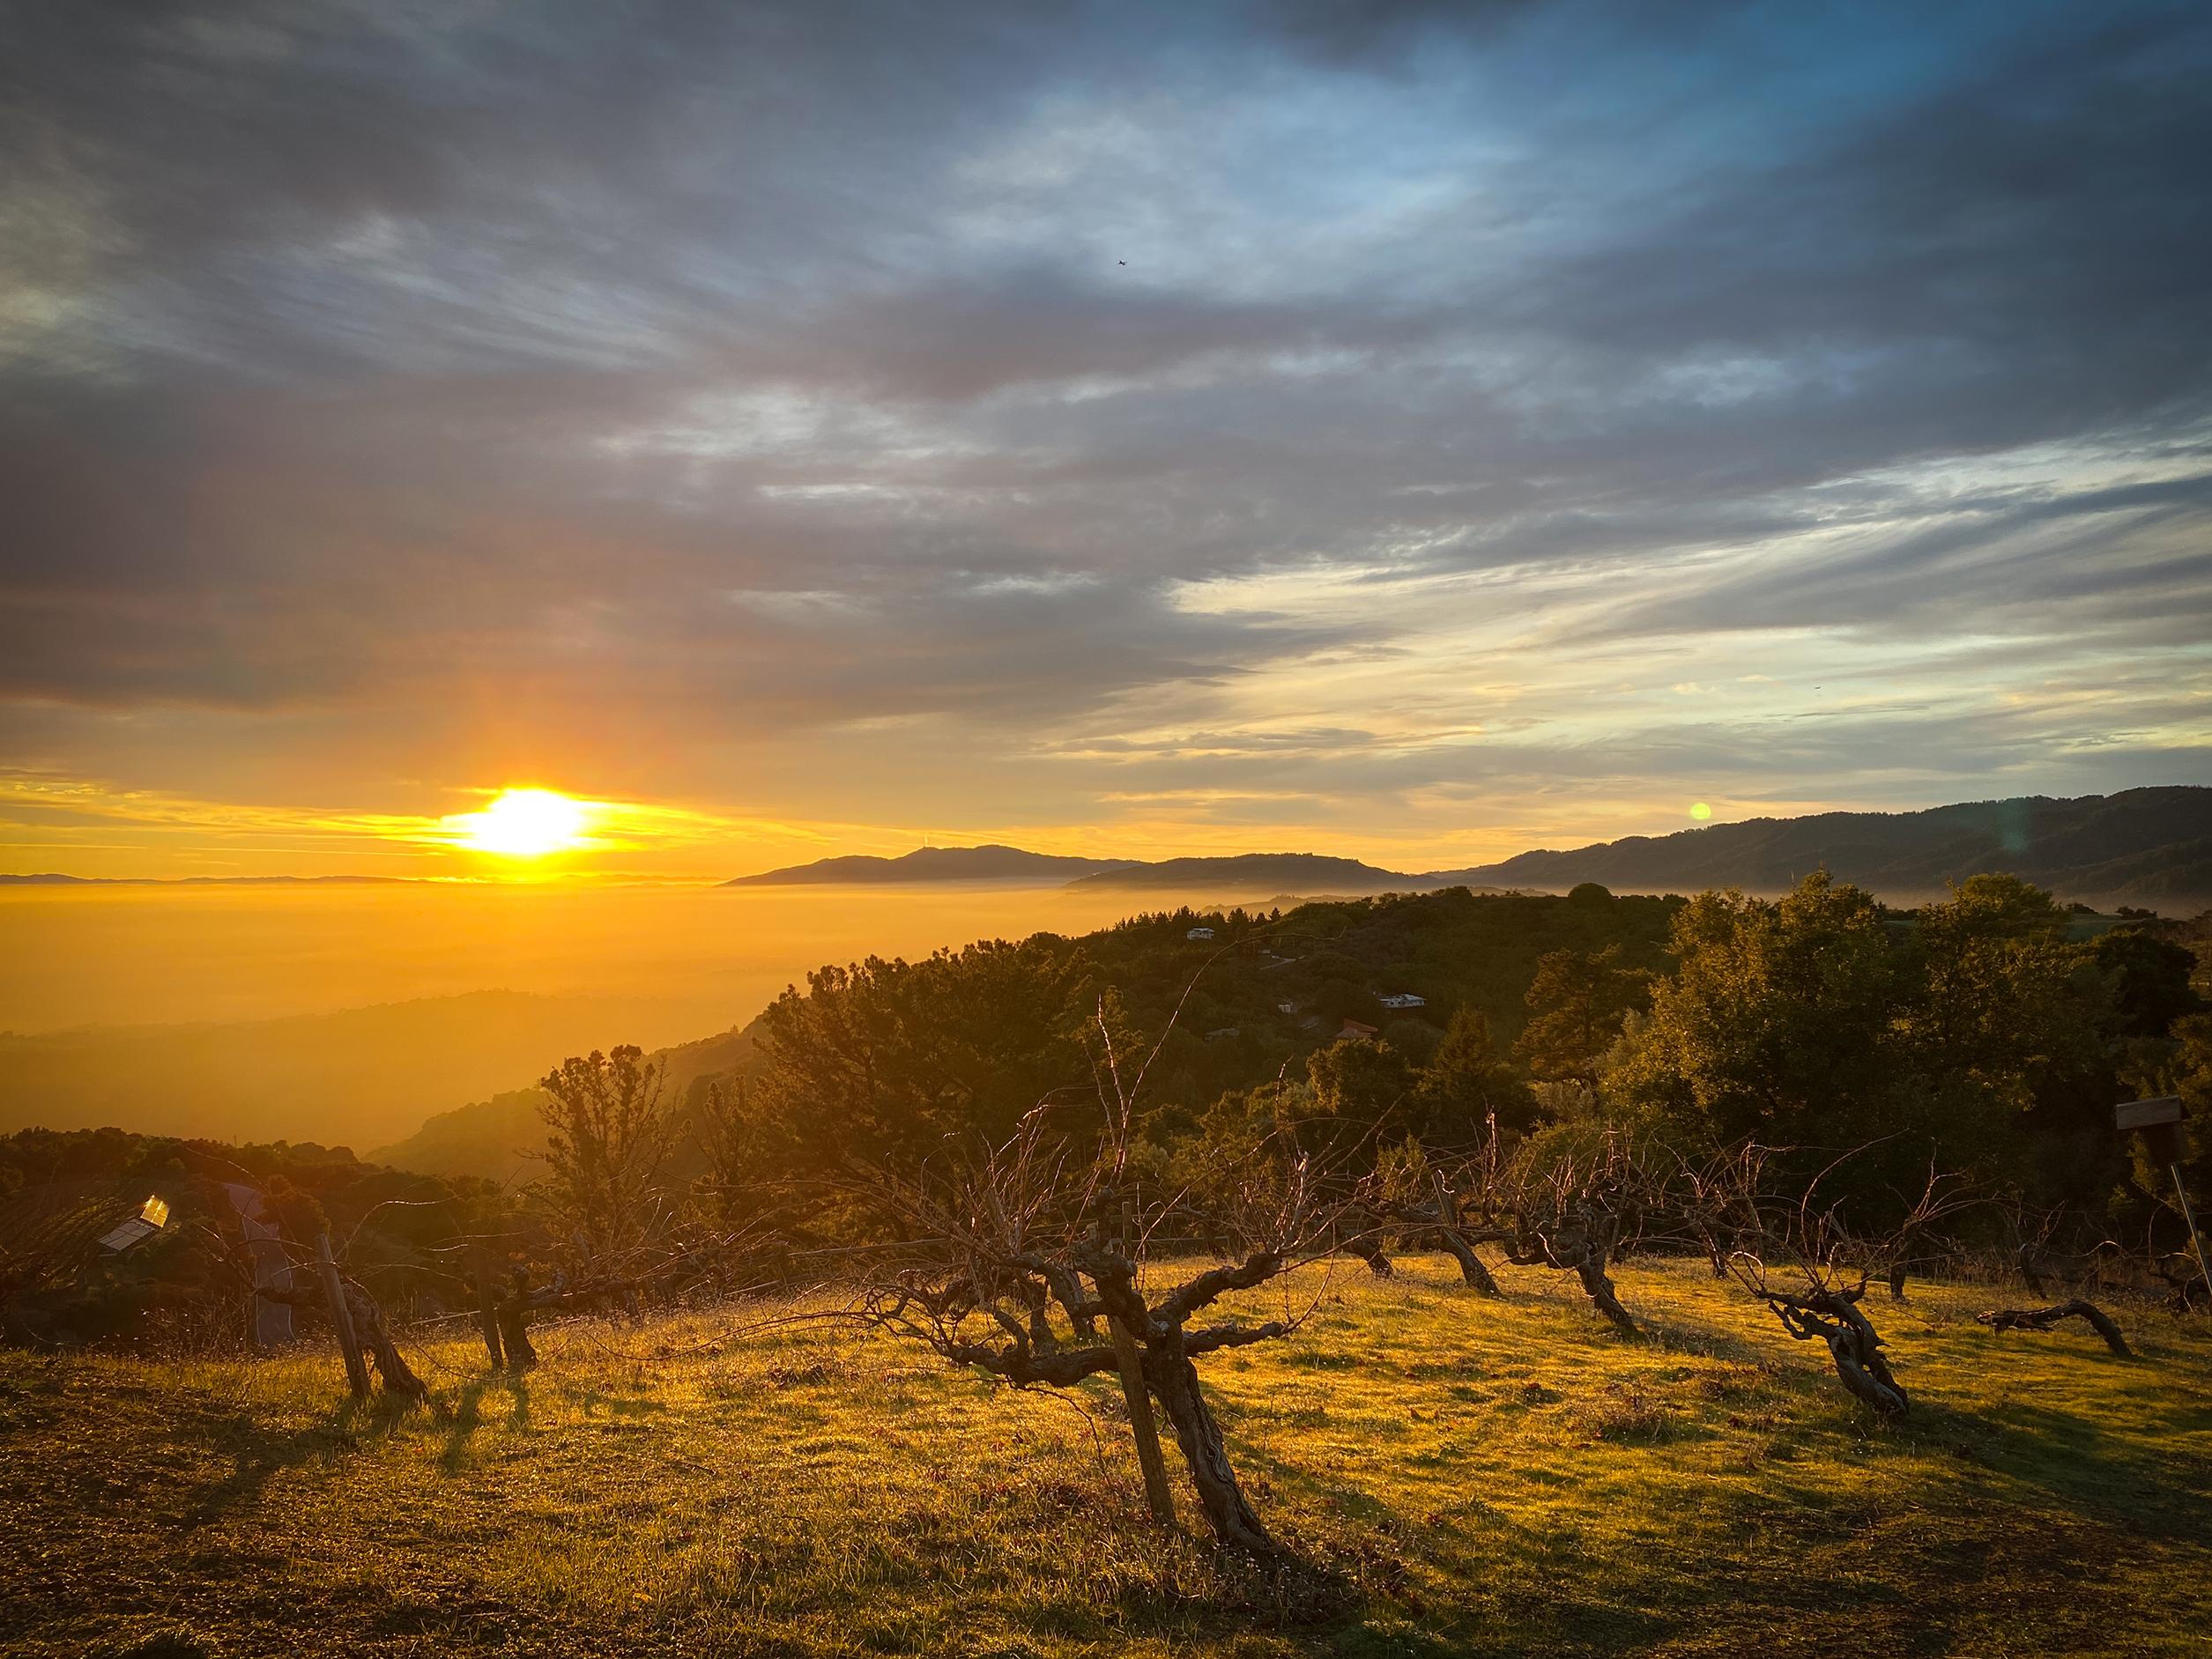 Ridge Monte Bello: On the edge of North America